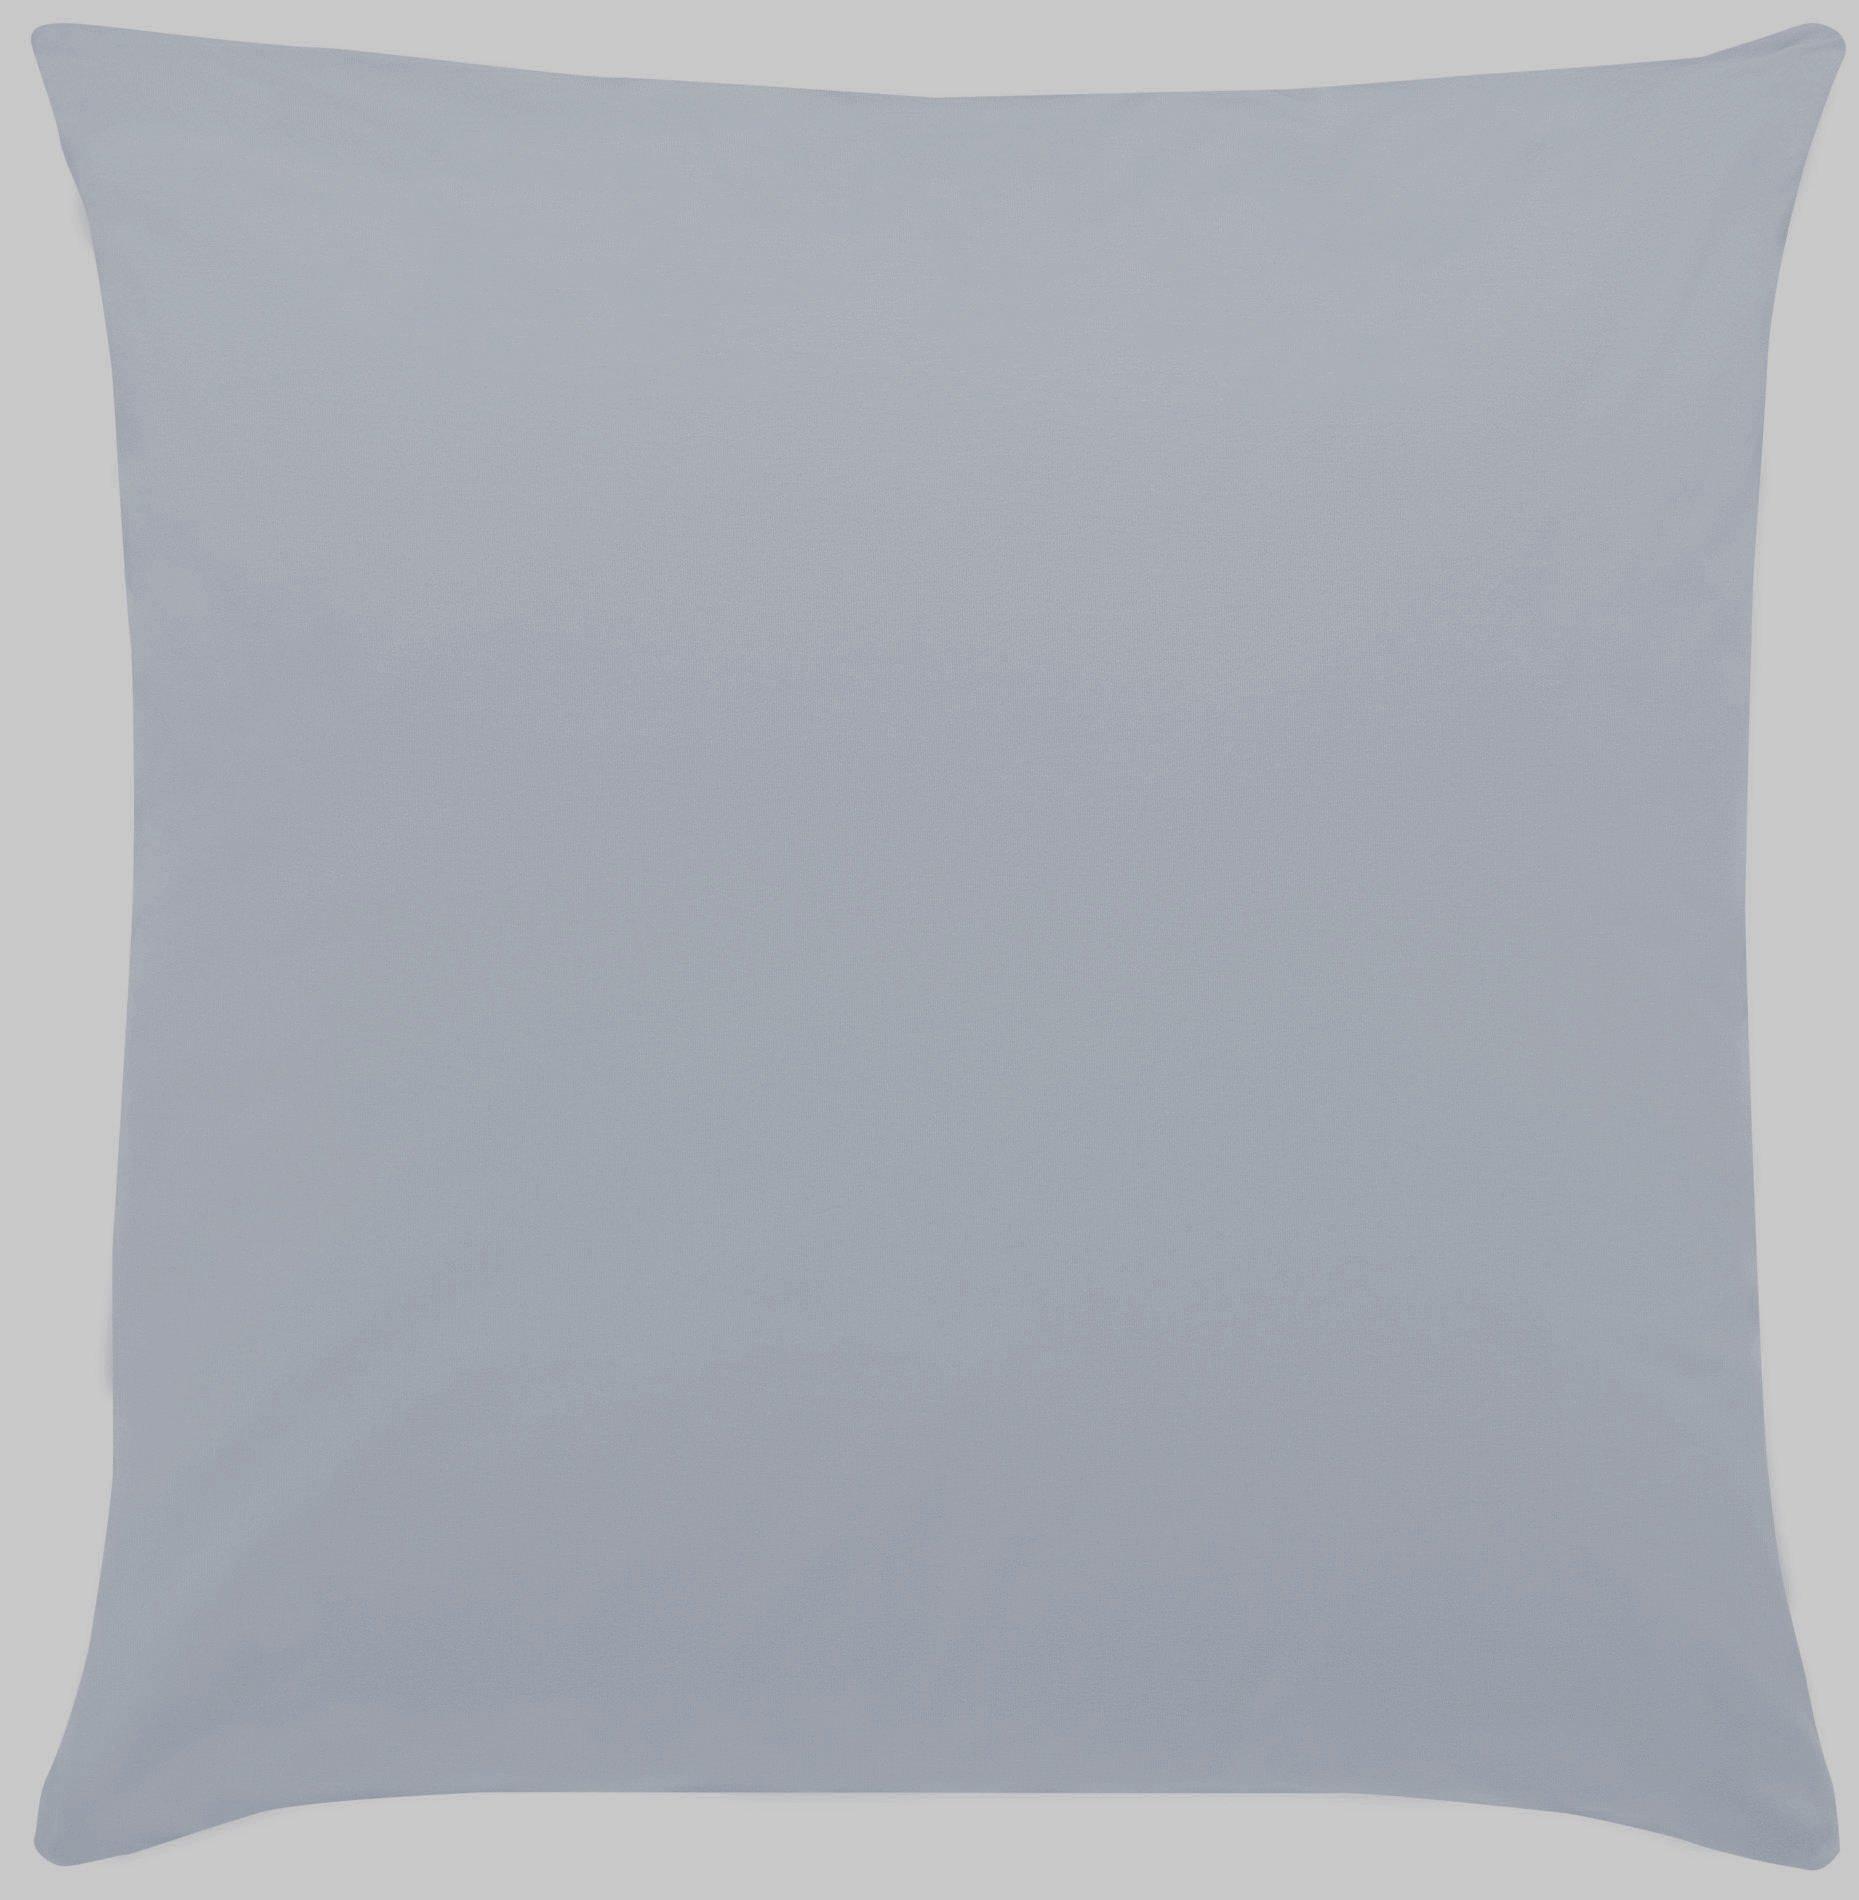 K.-Bezug eisblau 80x80cm